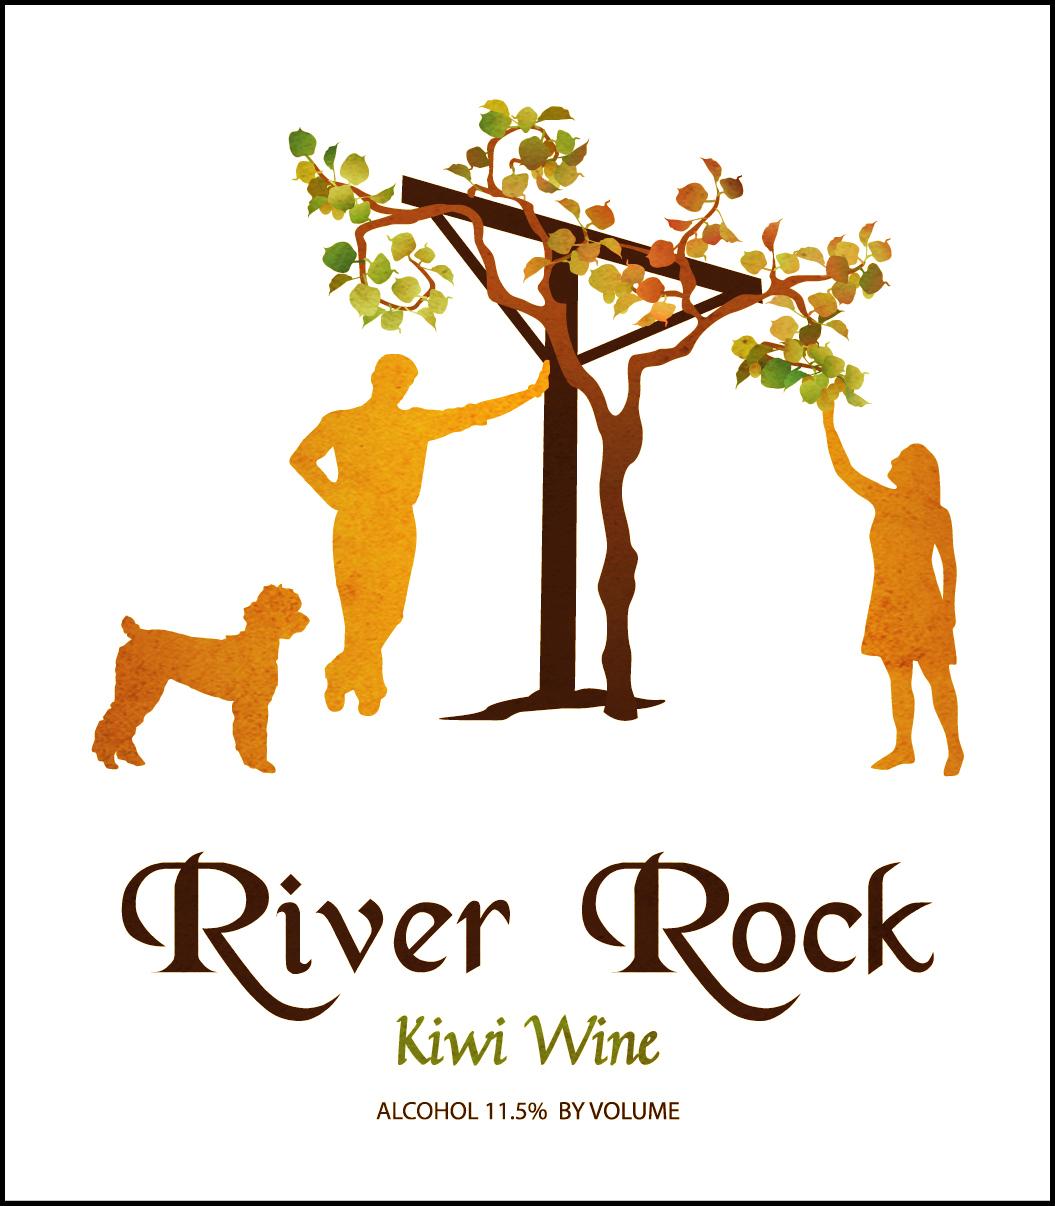 River Rock Kiwi Wine Labeltexture